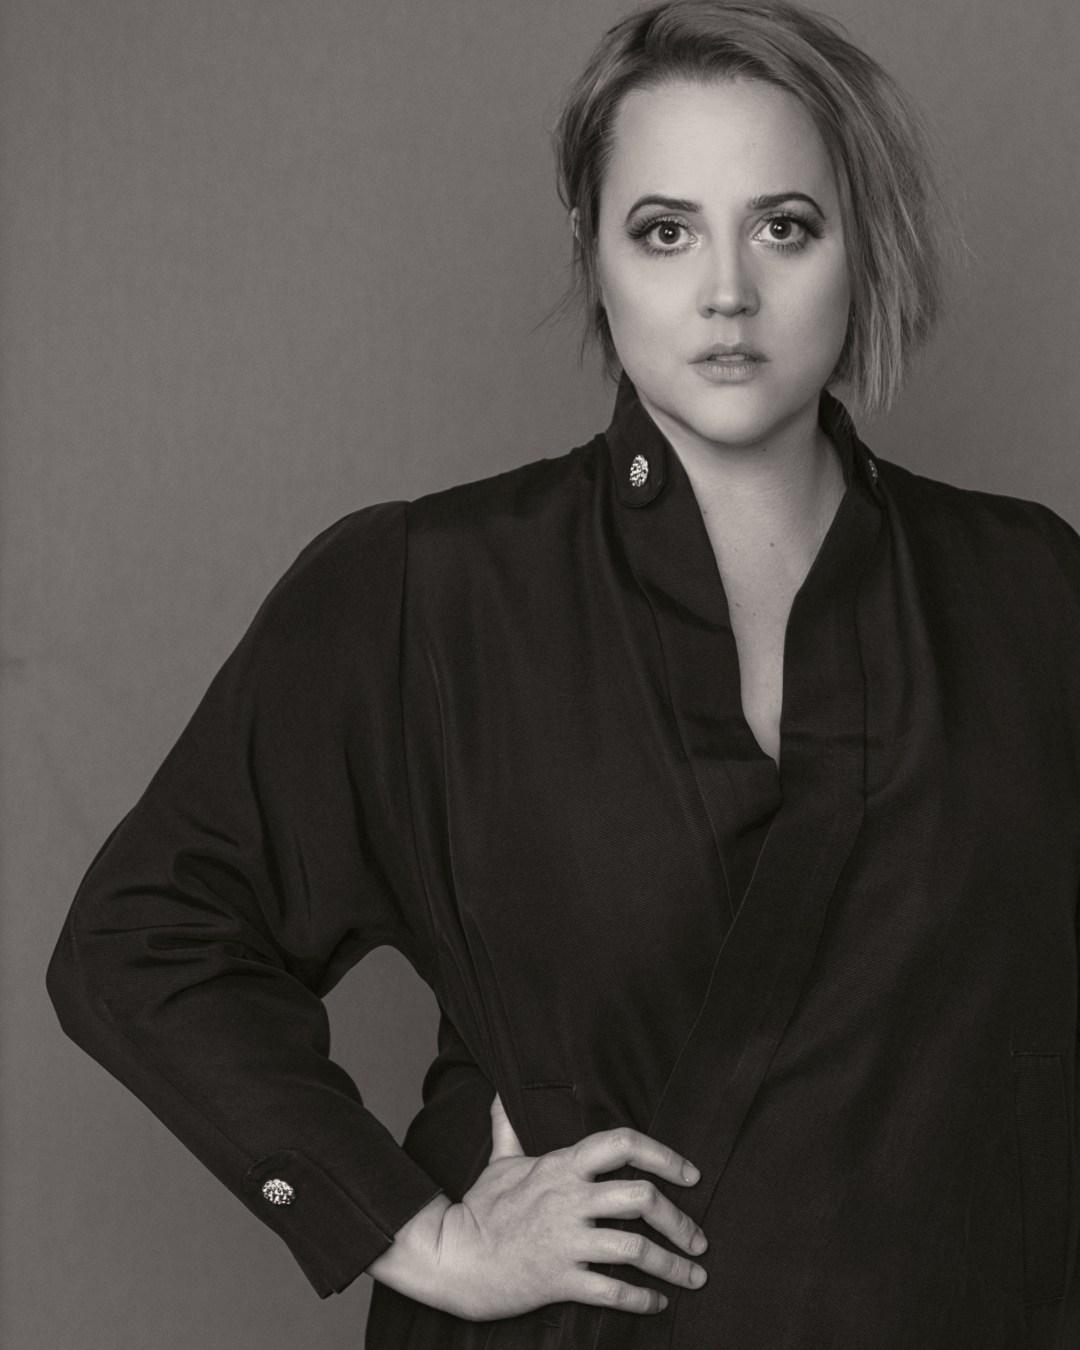 Studio shot - Photo by Molly Condit at Great Bear Media